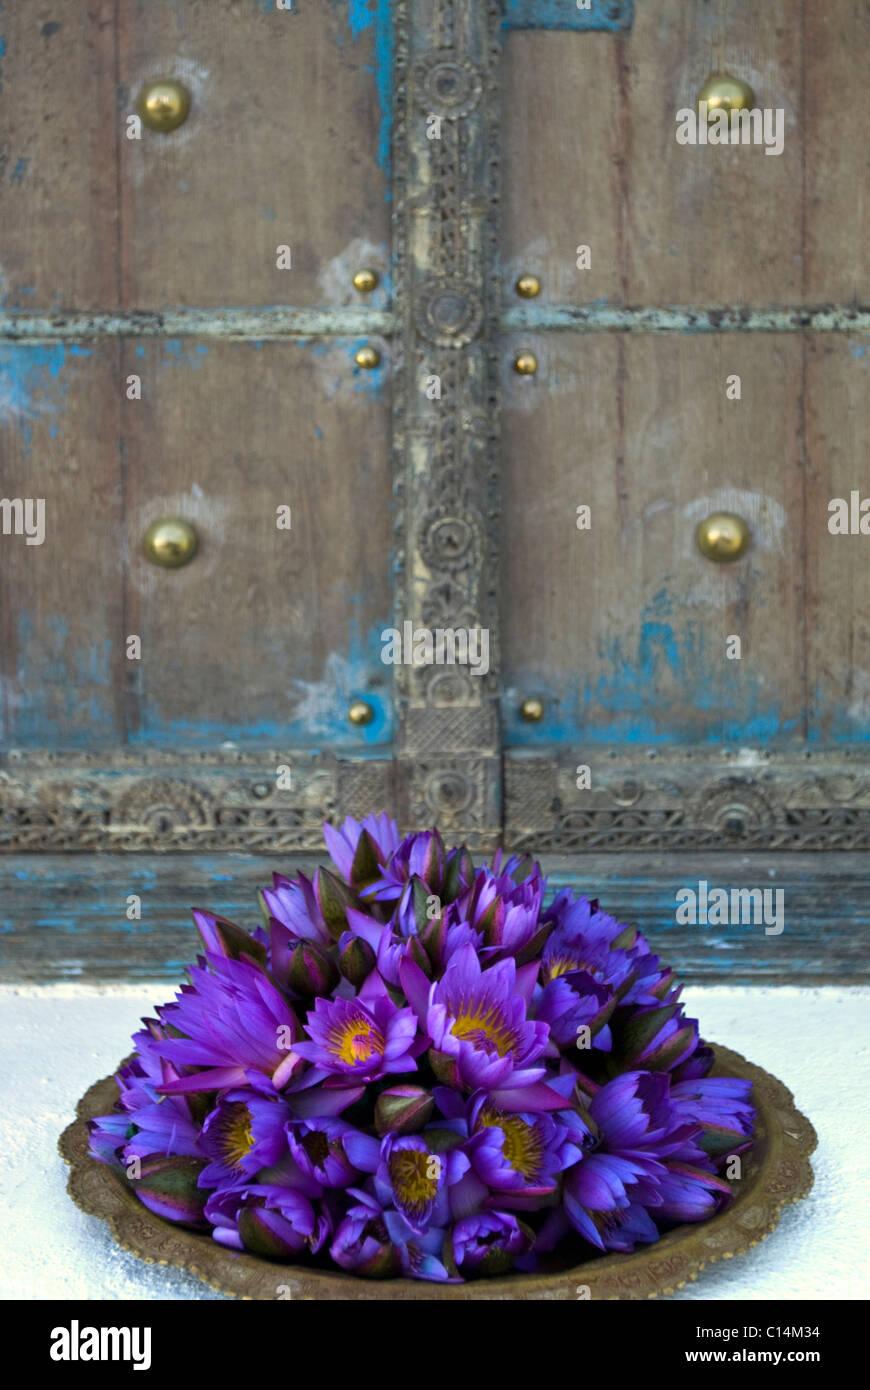 Decorative flowers, Sri Lanka - Stock Image